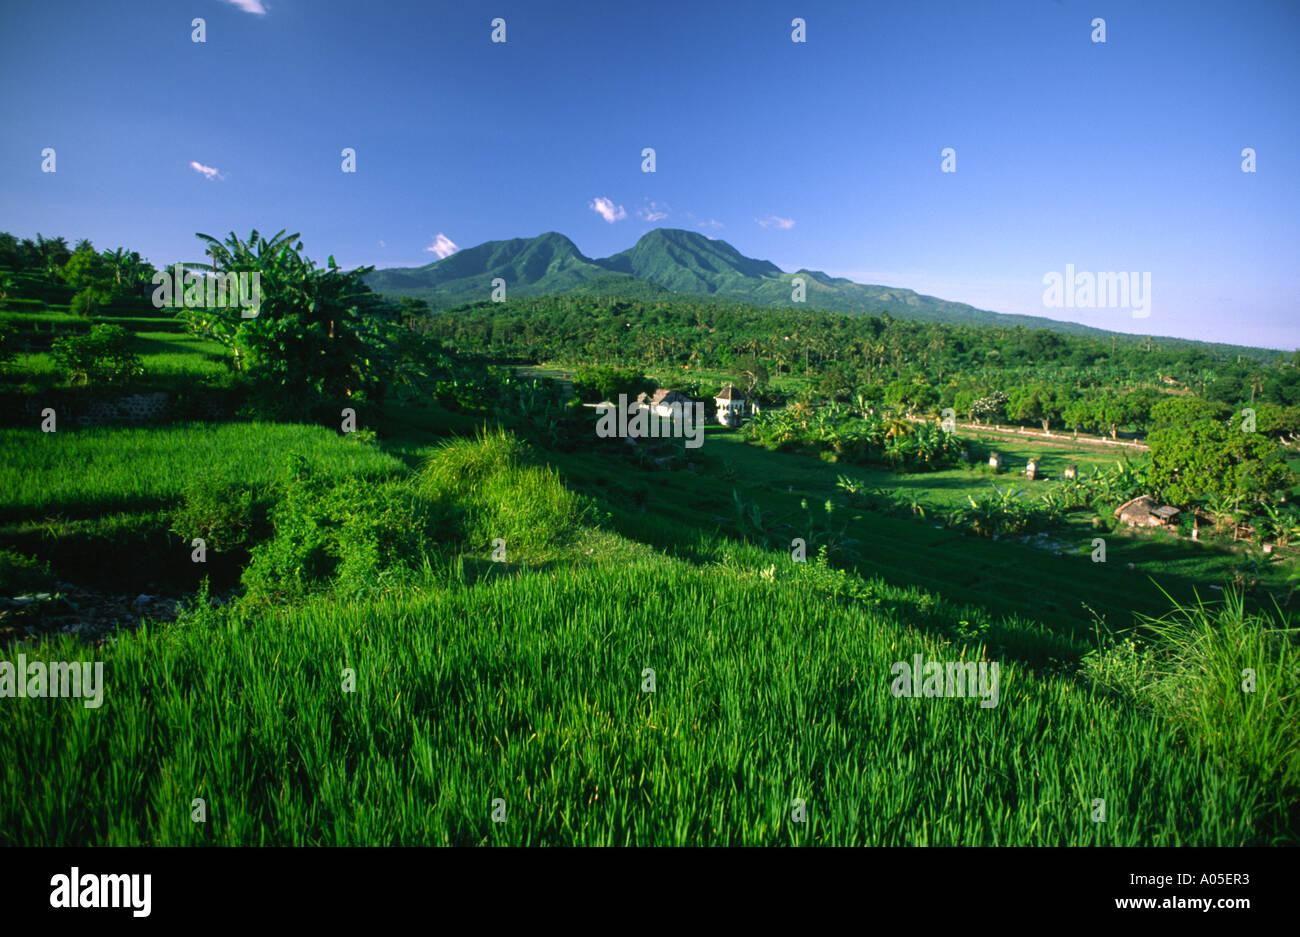 Indonesia Bali Campos De Arroz En Terrazas Volcán Monte